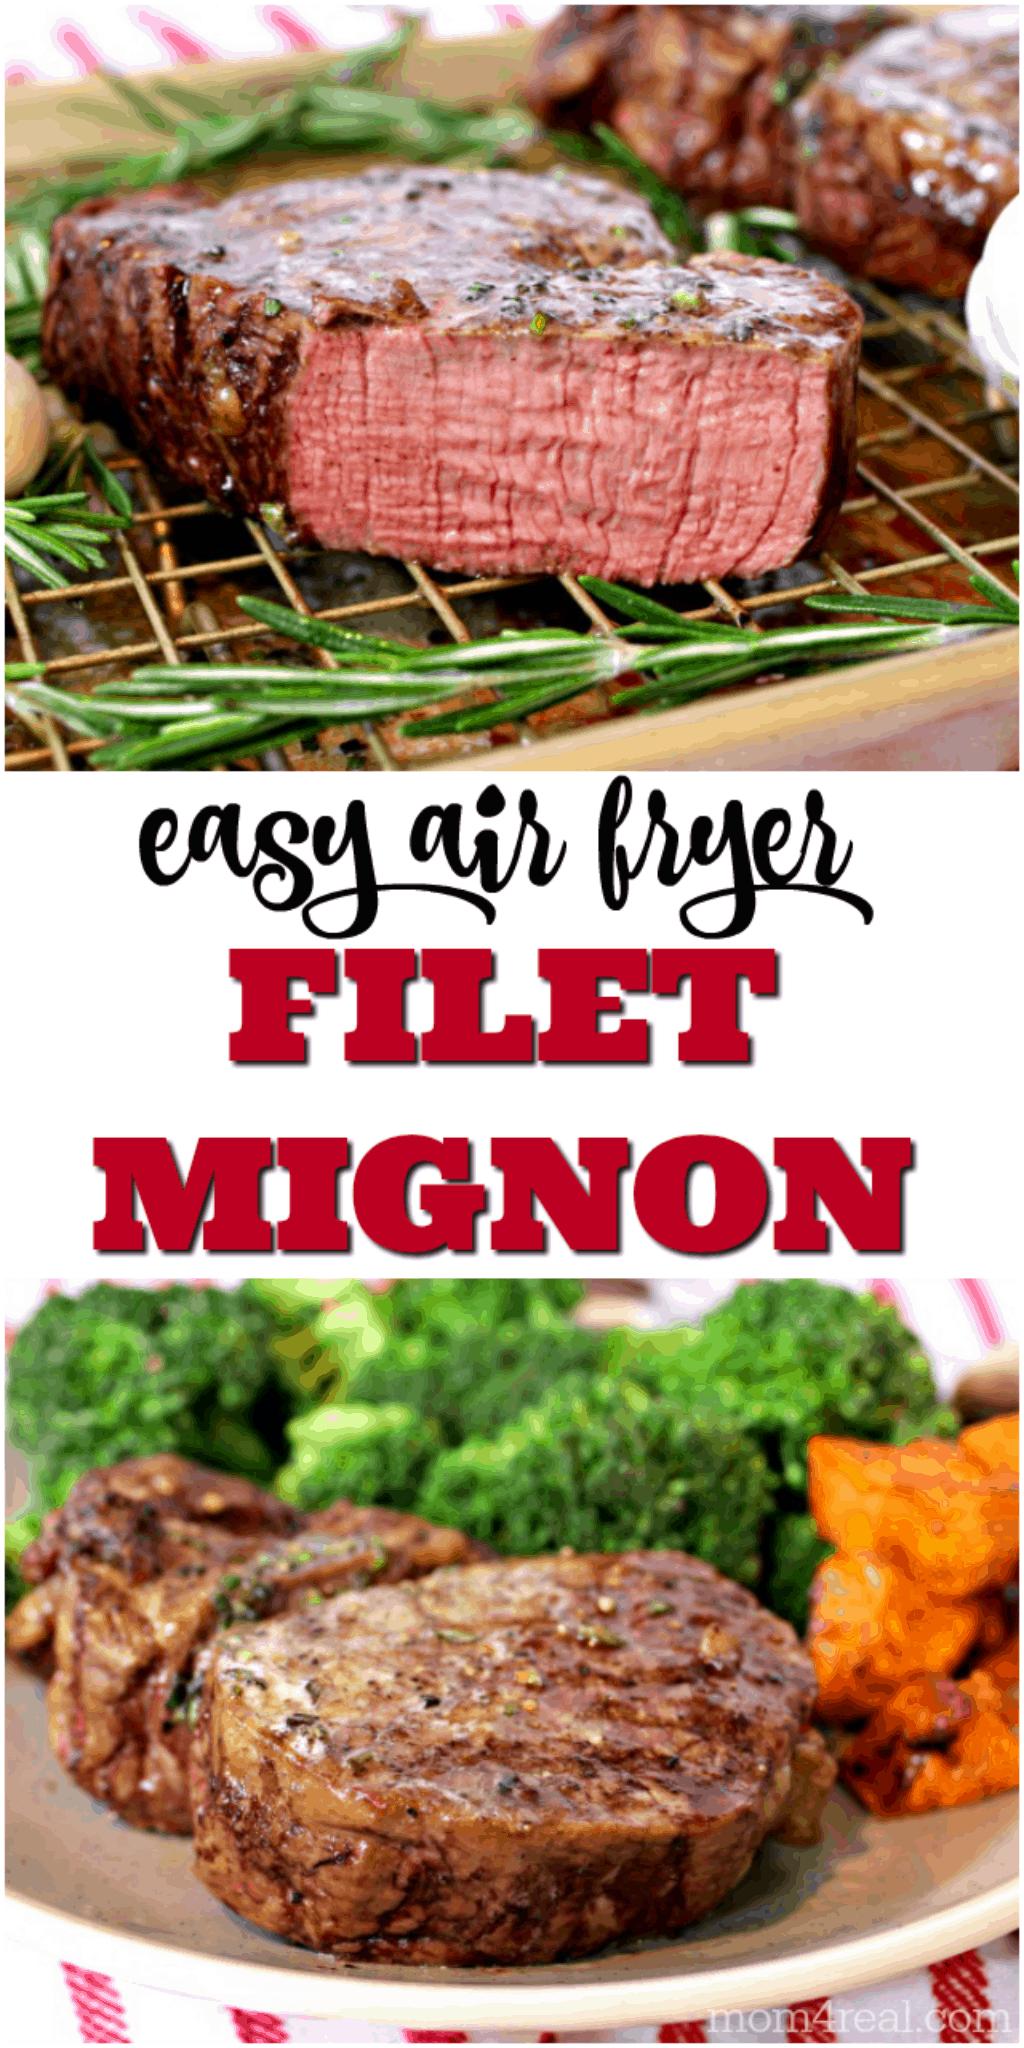 Air Fryer Filet Mignon That Tastes Like Upscale Restaurant Steak Recipe Air Fryer Recipes Healthy Air Fryer Dinner Recipes Air Fryer Recipes Breakfast